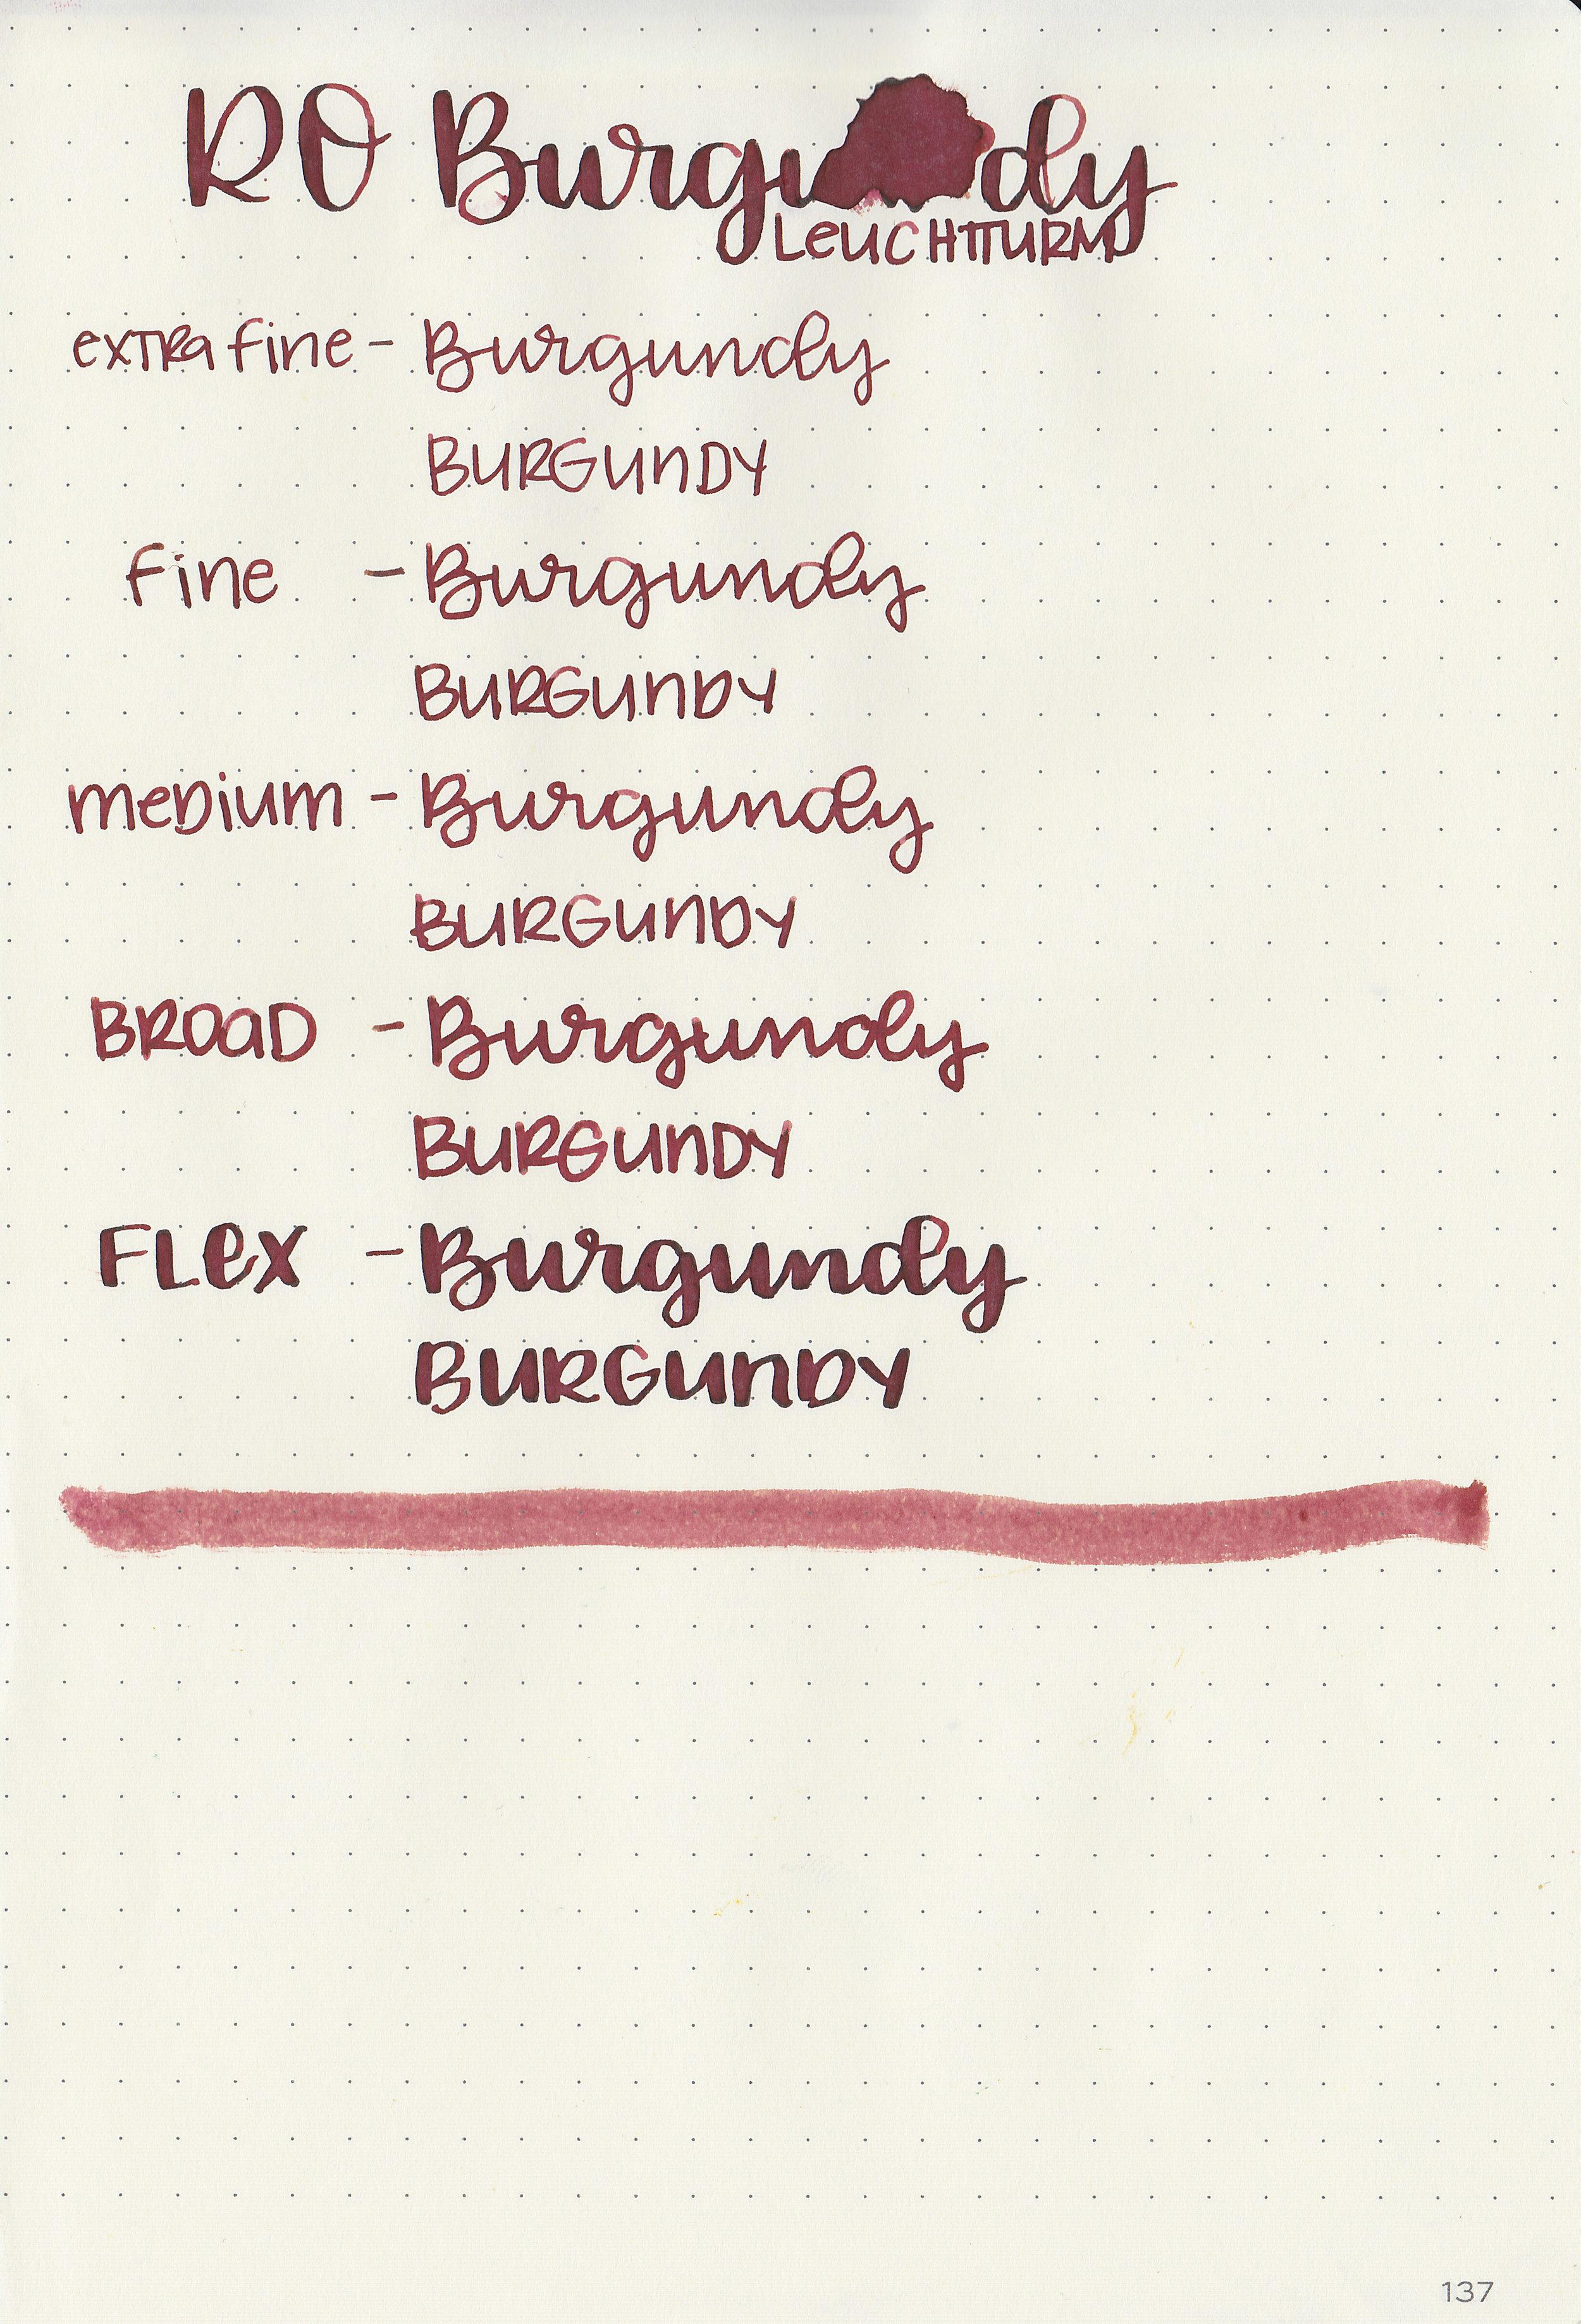 ro-burgundy-10.jpg